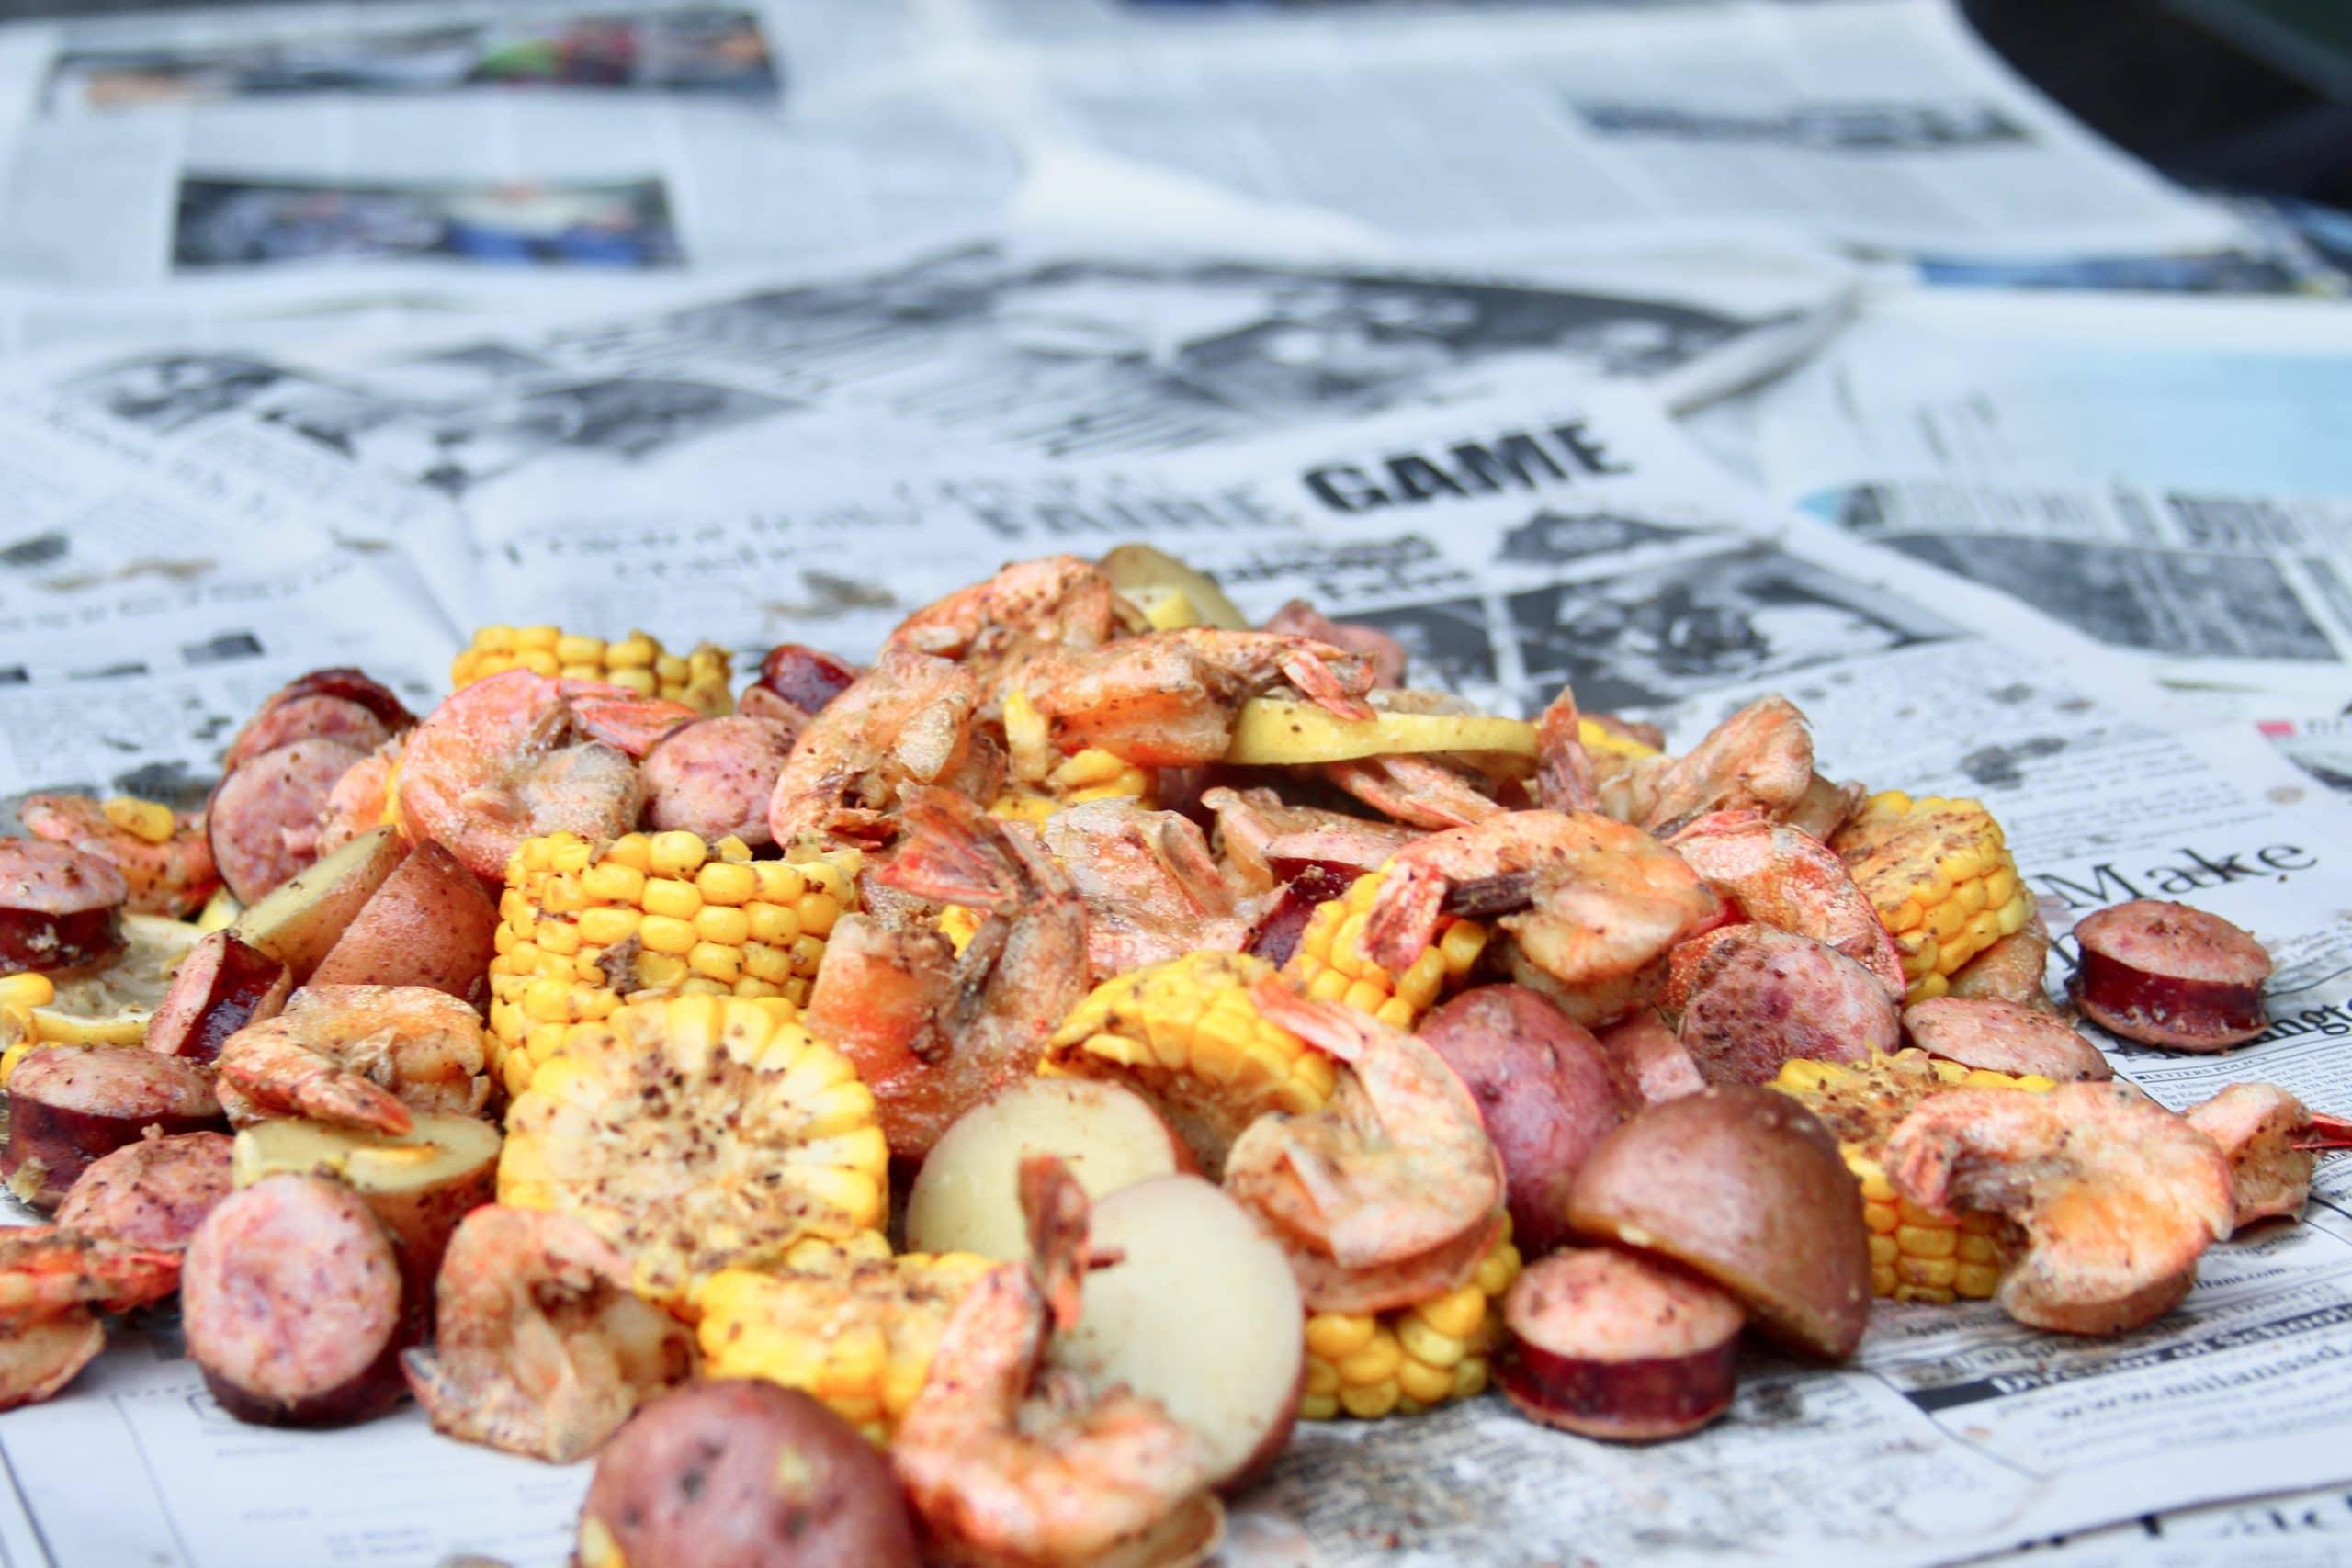 Boiled shrimp on newspaper